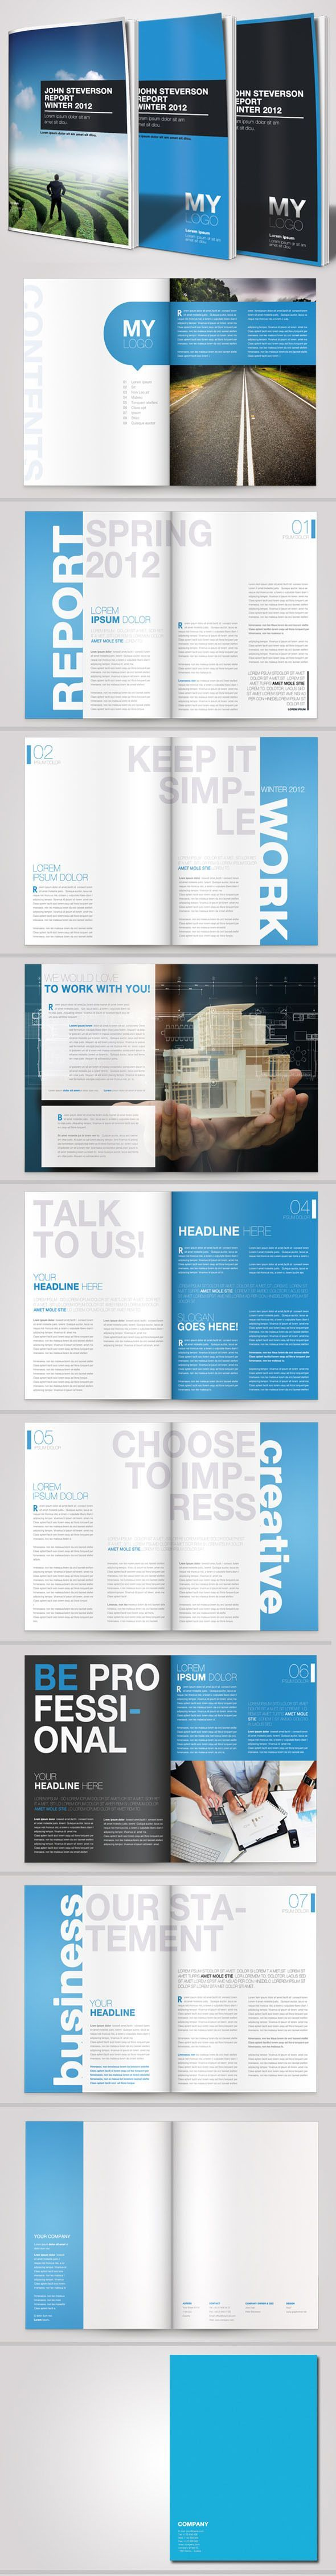 A4 Business Brochure Vol. 03 by Danijel Mokic via #Behance | #GraphicDesign #Brochure